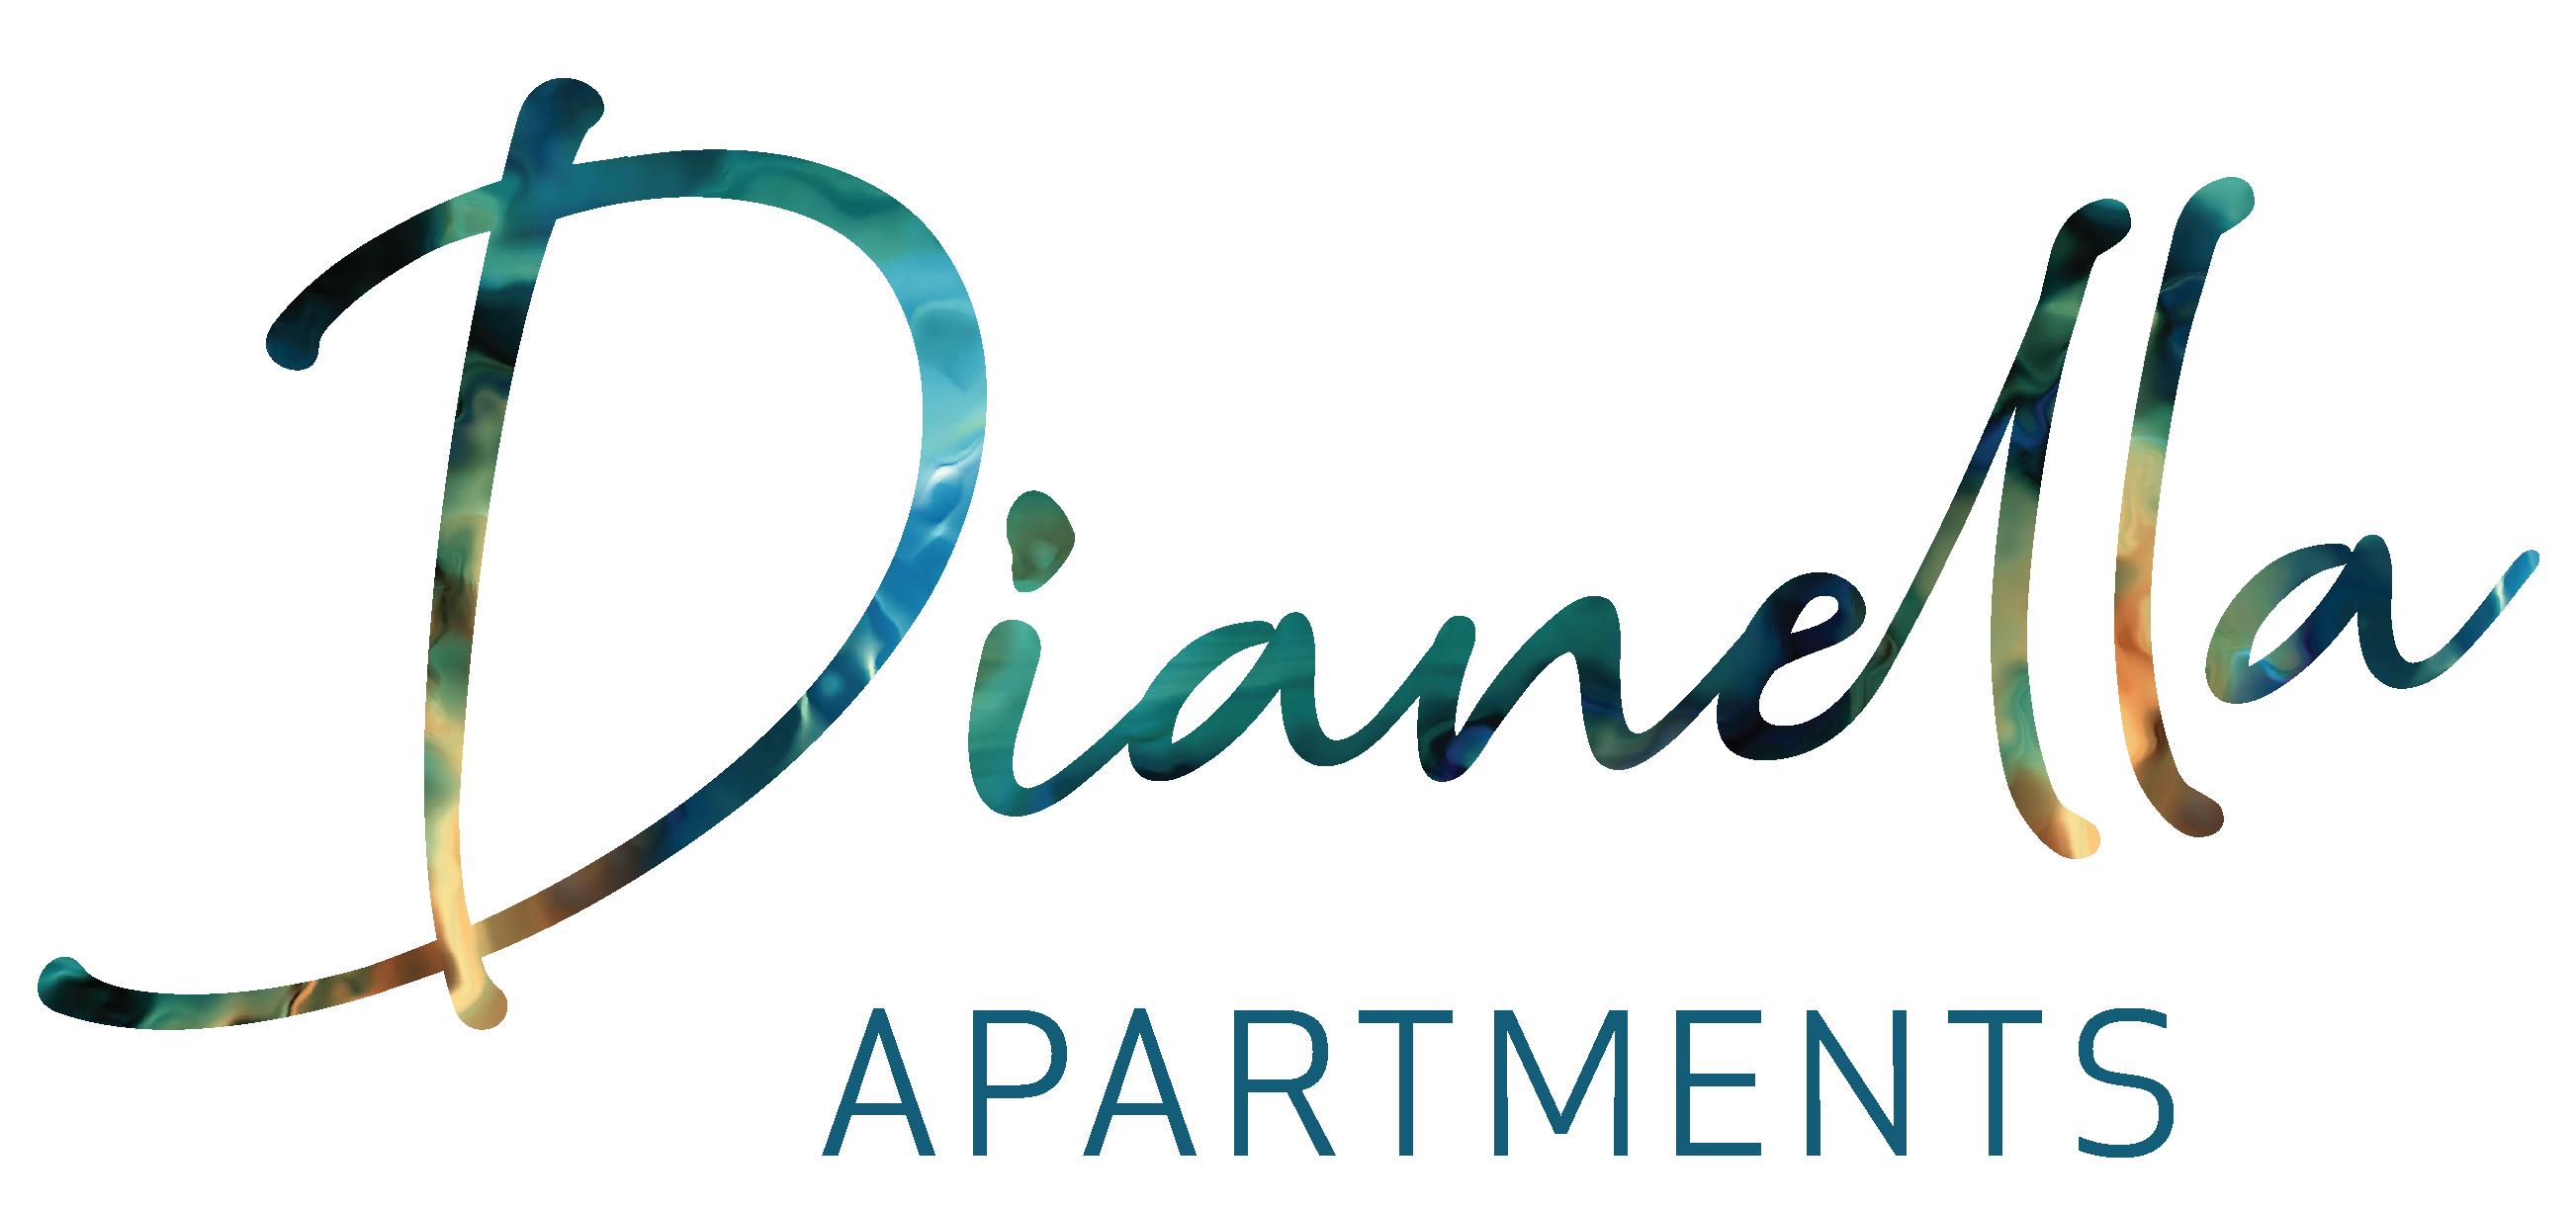 dianella logo